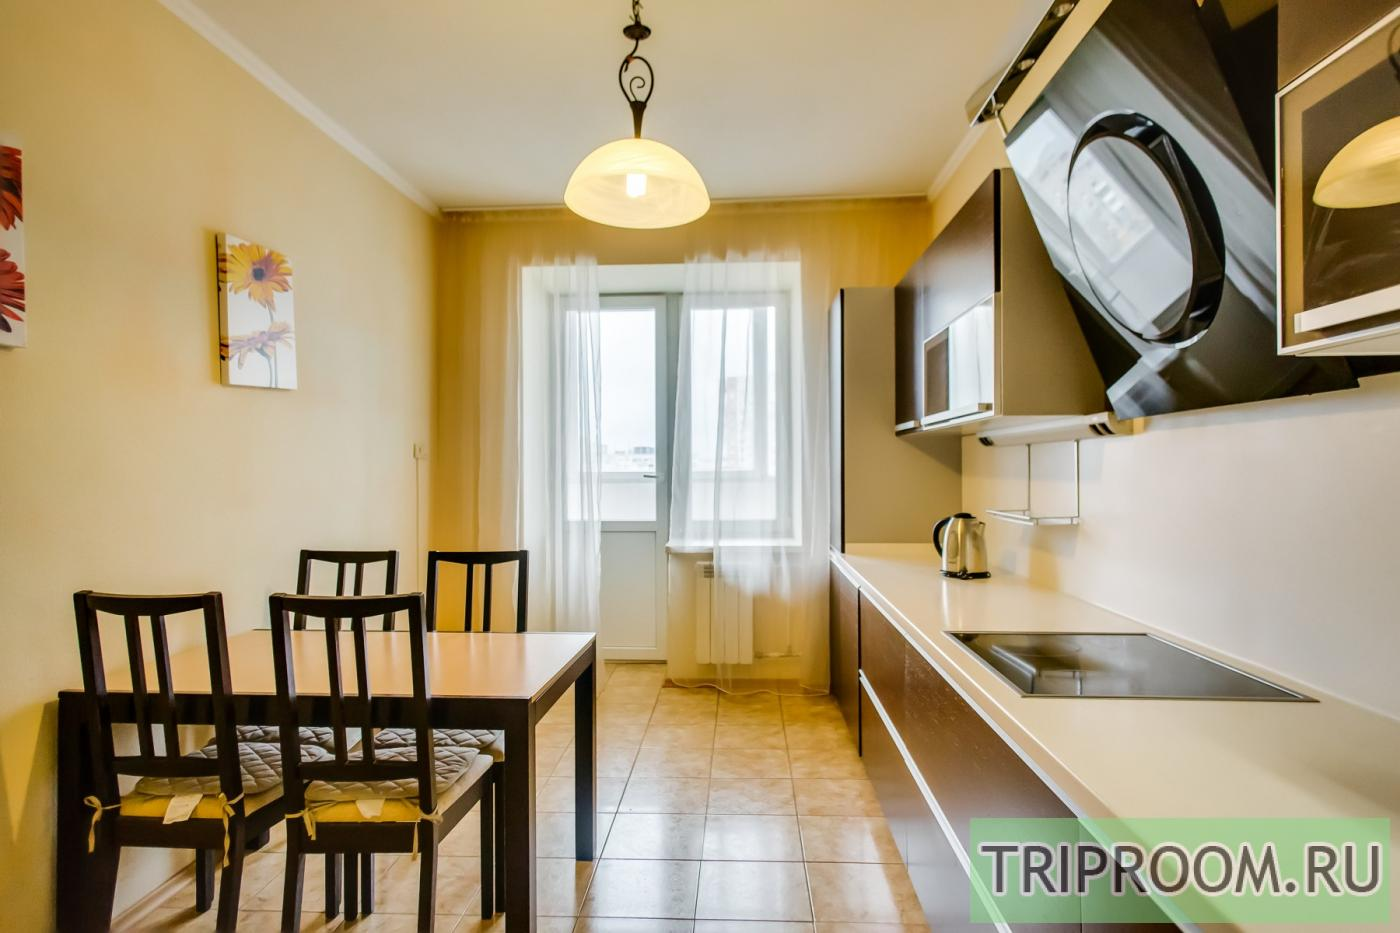 2-комнатная квартира посуточно (вариант № 23730), ул. Максима Горького улица, фото № 13